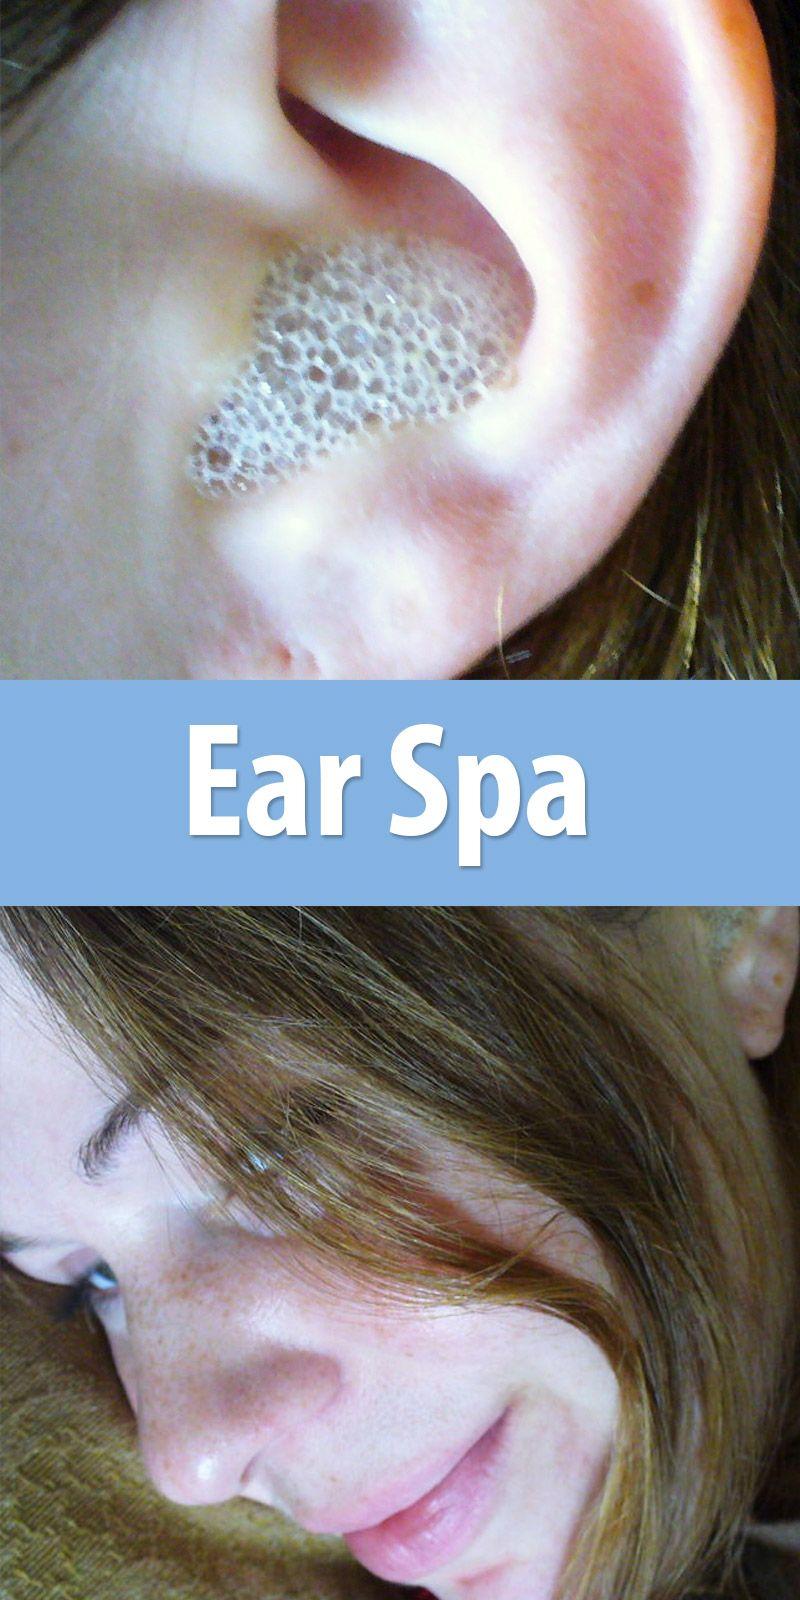 Ear spa ear wax hydrogen peroxide and remedies ear spa hydrogen peroxide earspa dayear wax removalitchy eyeshousehold tips diy solutioingenieria Images